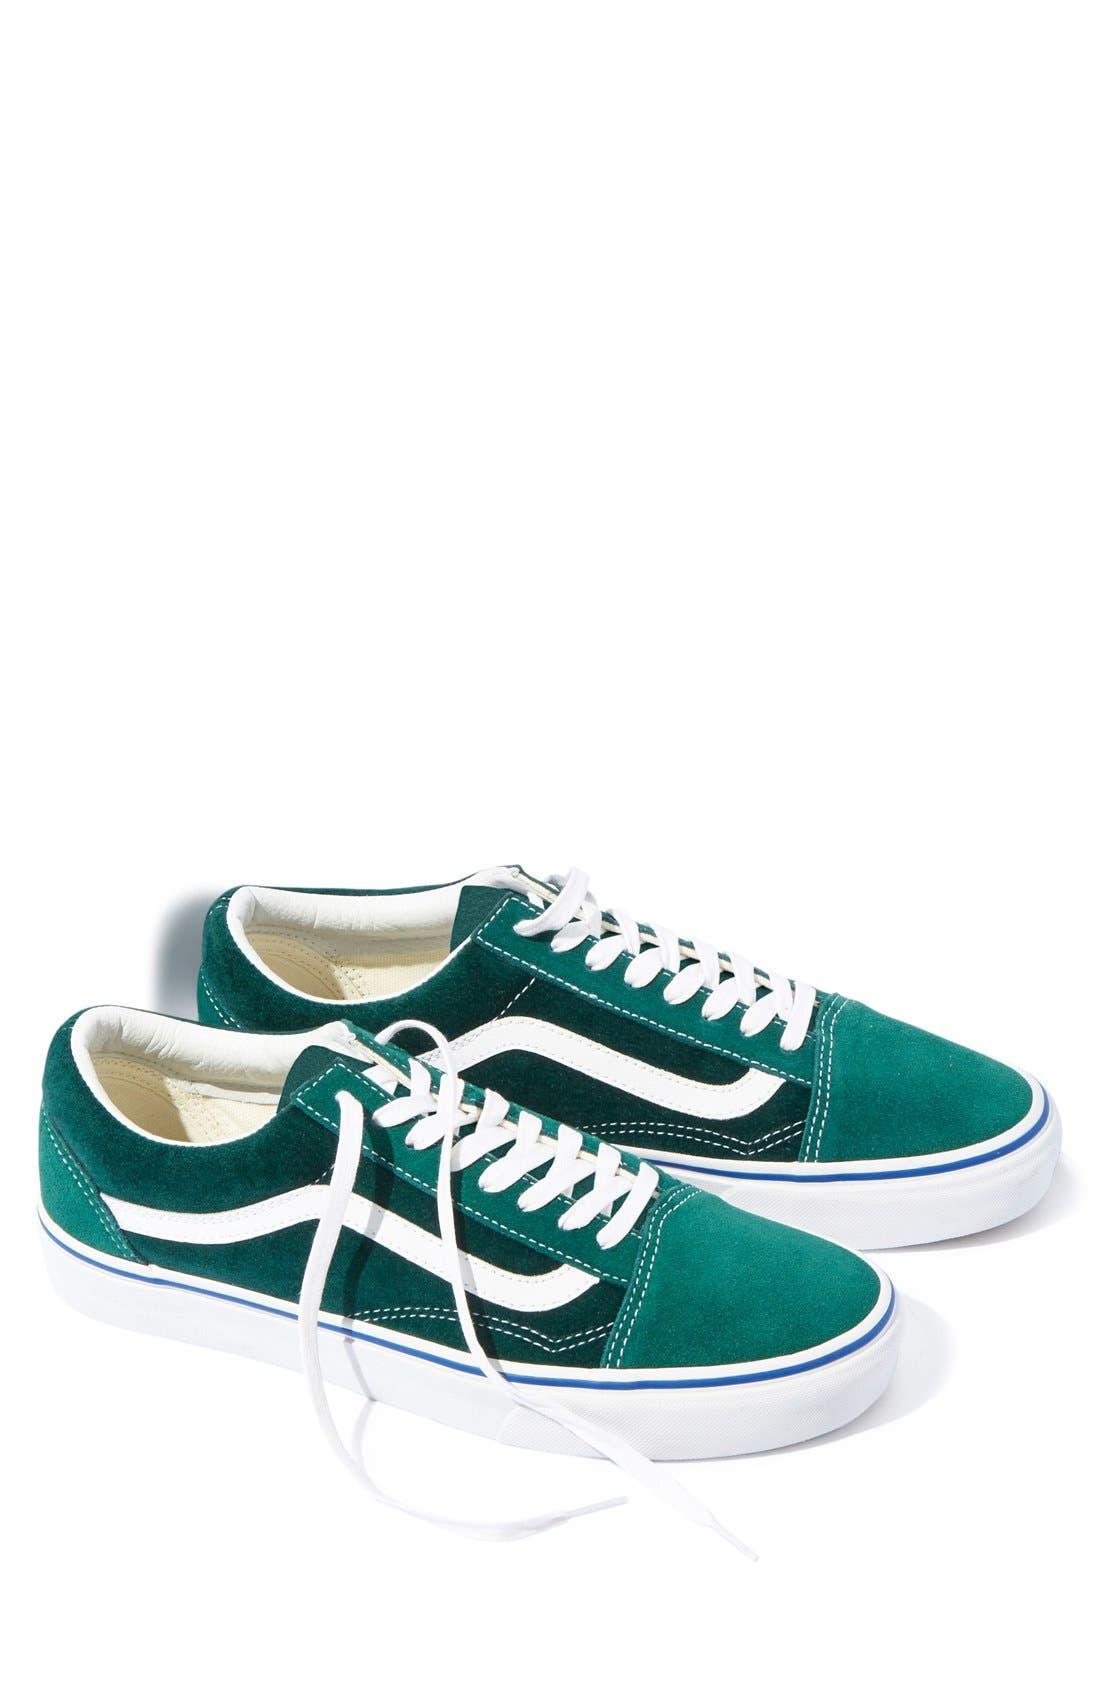 Main Image - Vans 'Old Skool' Velvet Sneaker (Men) (Nordstrom Exclusive)